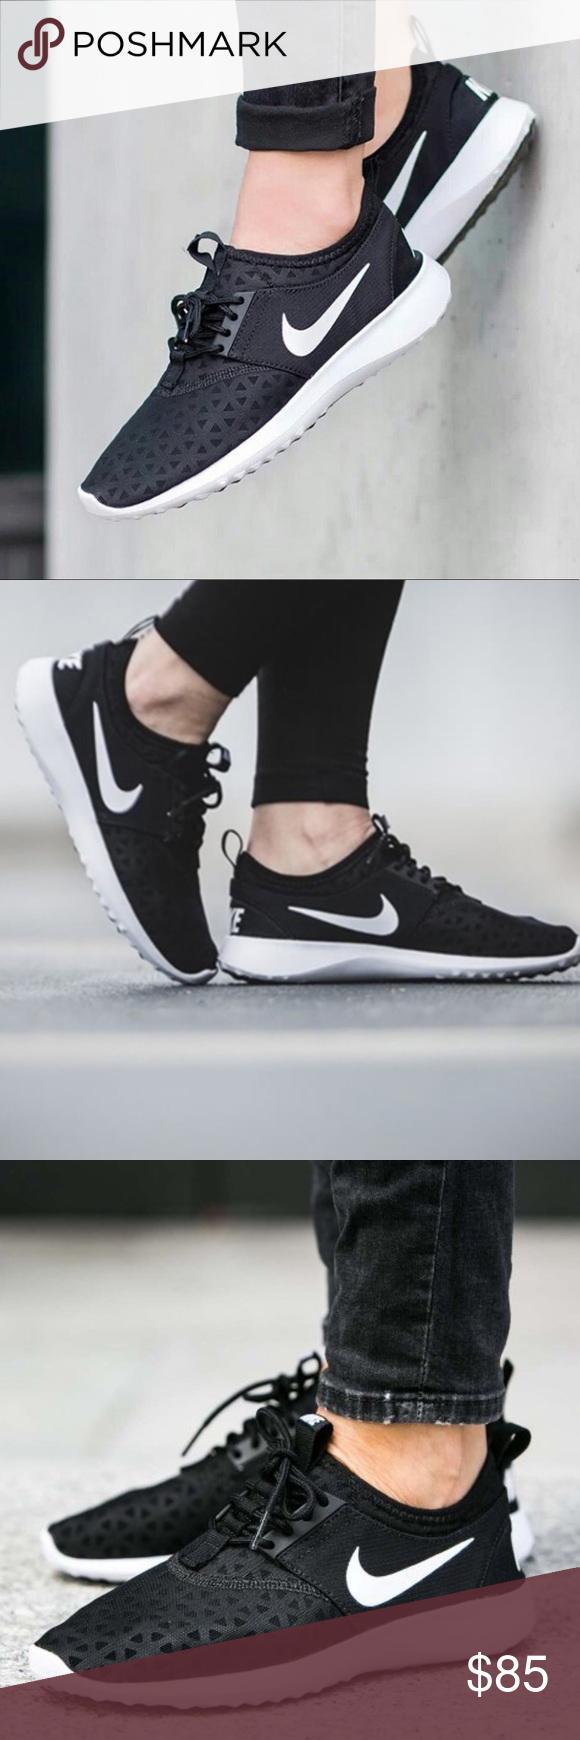 bianco e nero juvenate scarpe nike